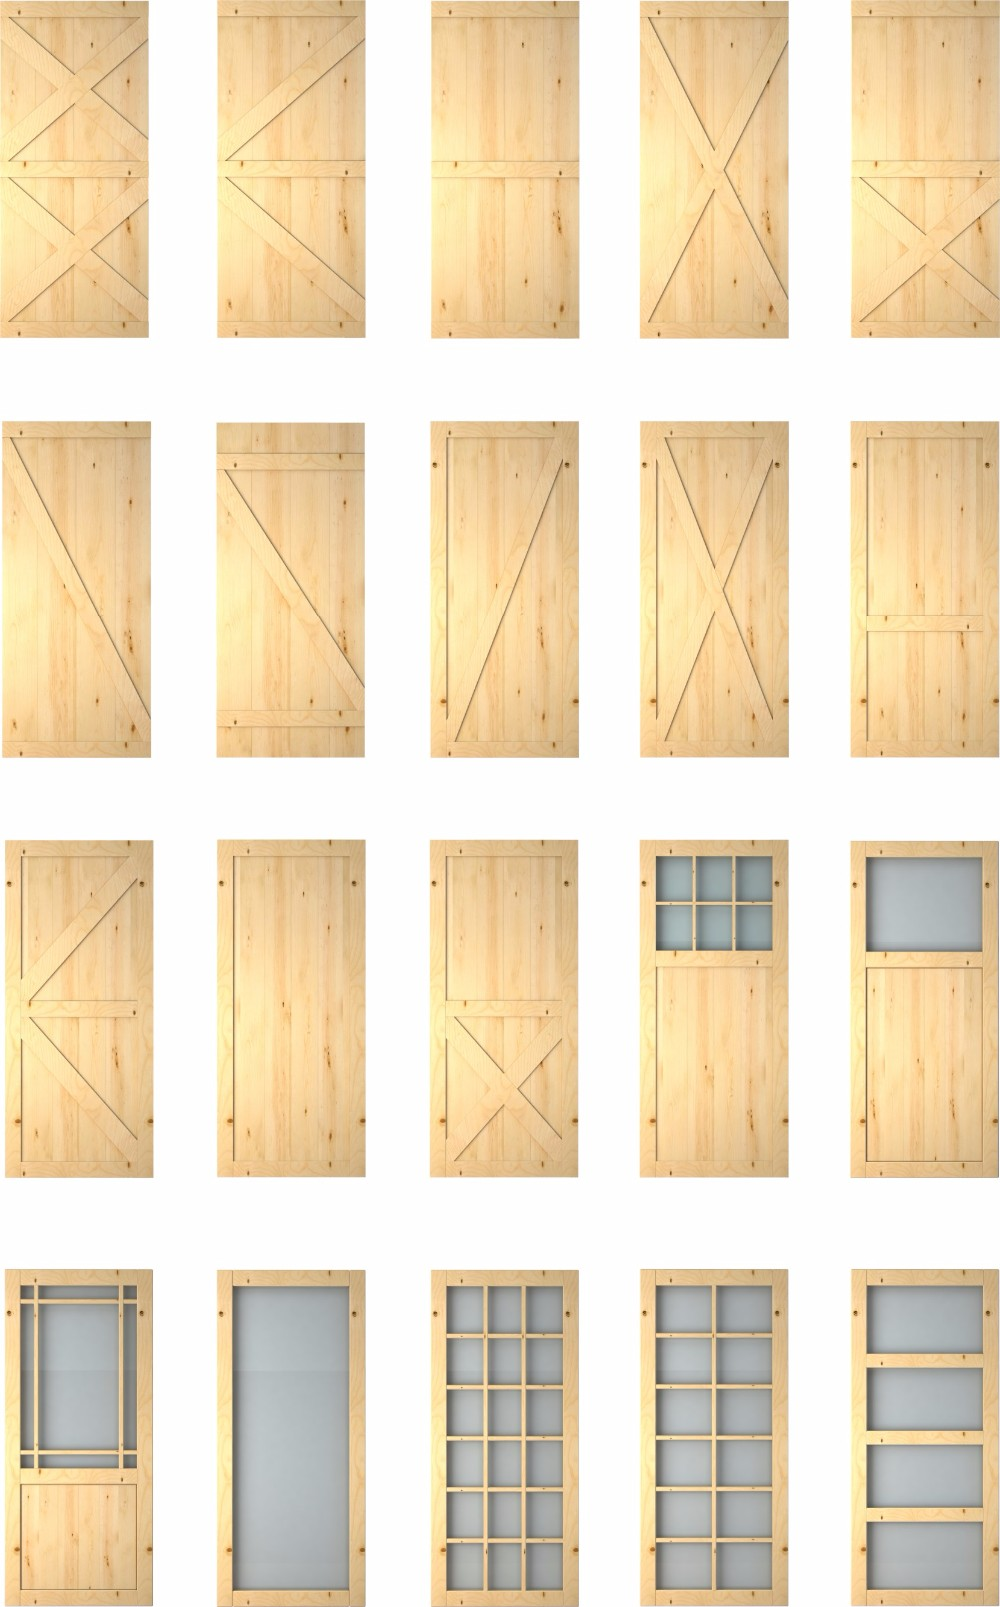 Attrayant Modern T Design 3 Panel Half Glass Solid Wood Interior Barn Door Slabs With  Sliding Door Hardware   Buy Barn Door,Barn Door Slab,Half Glass Wooden ...